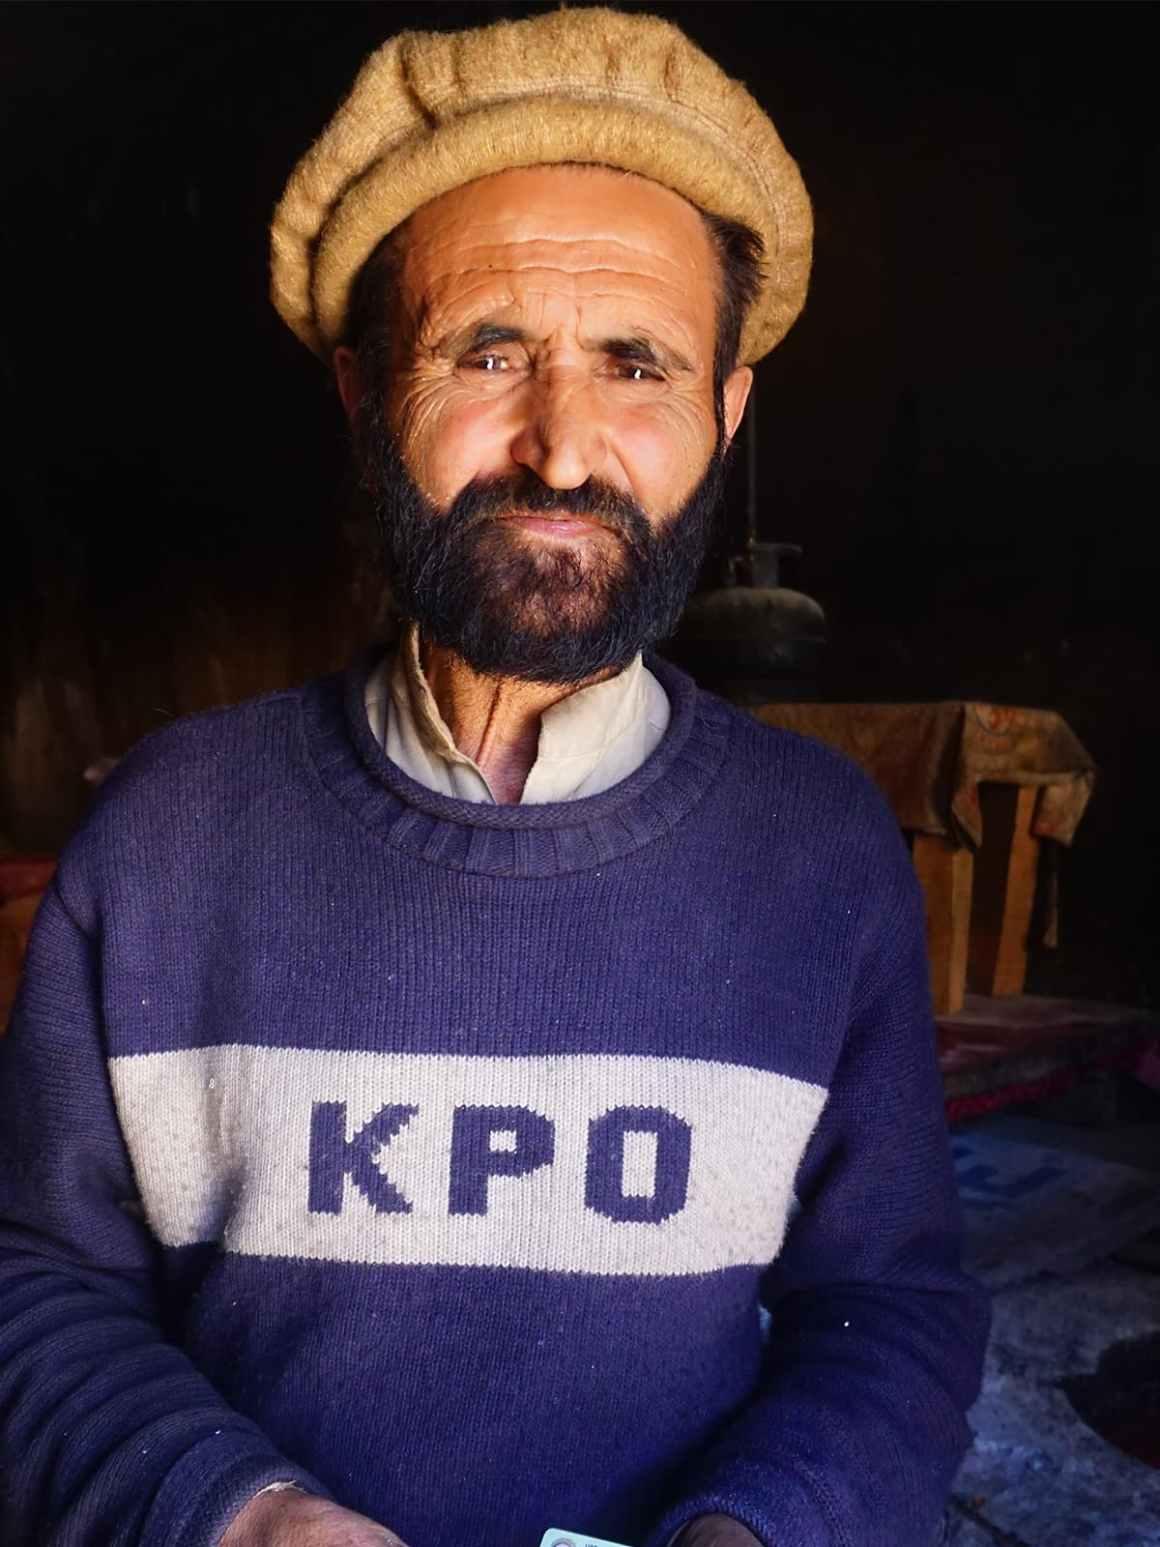 A Wakhi man from Ishkoman Valley in Gilgit-Baltistan